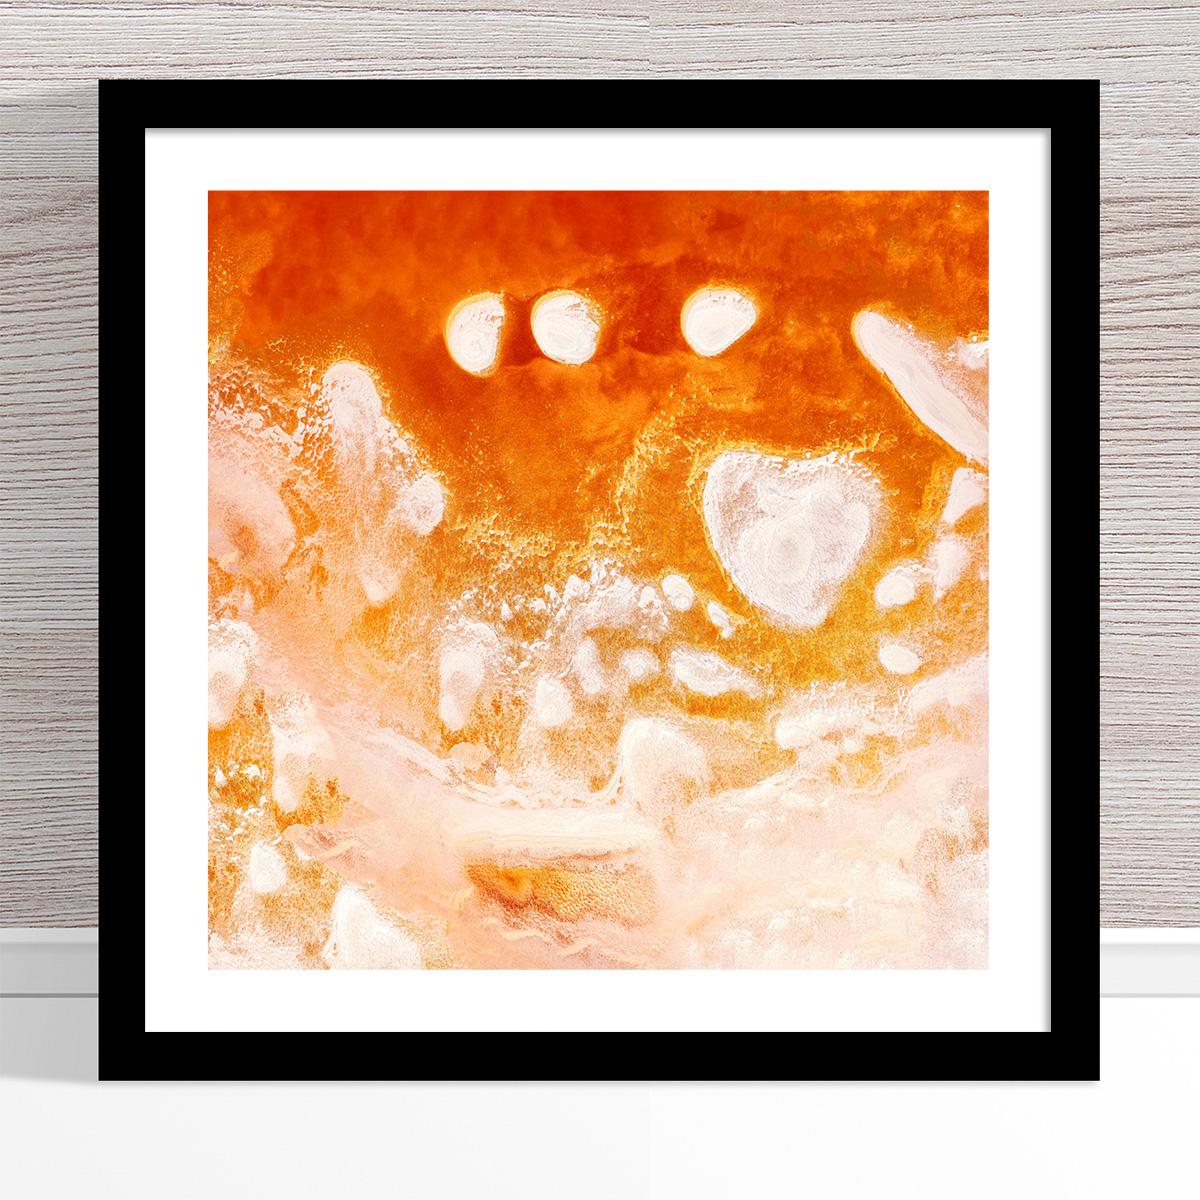 Chris Saunders - 'Aerial Salt 016' Black Frame